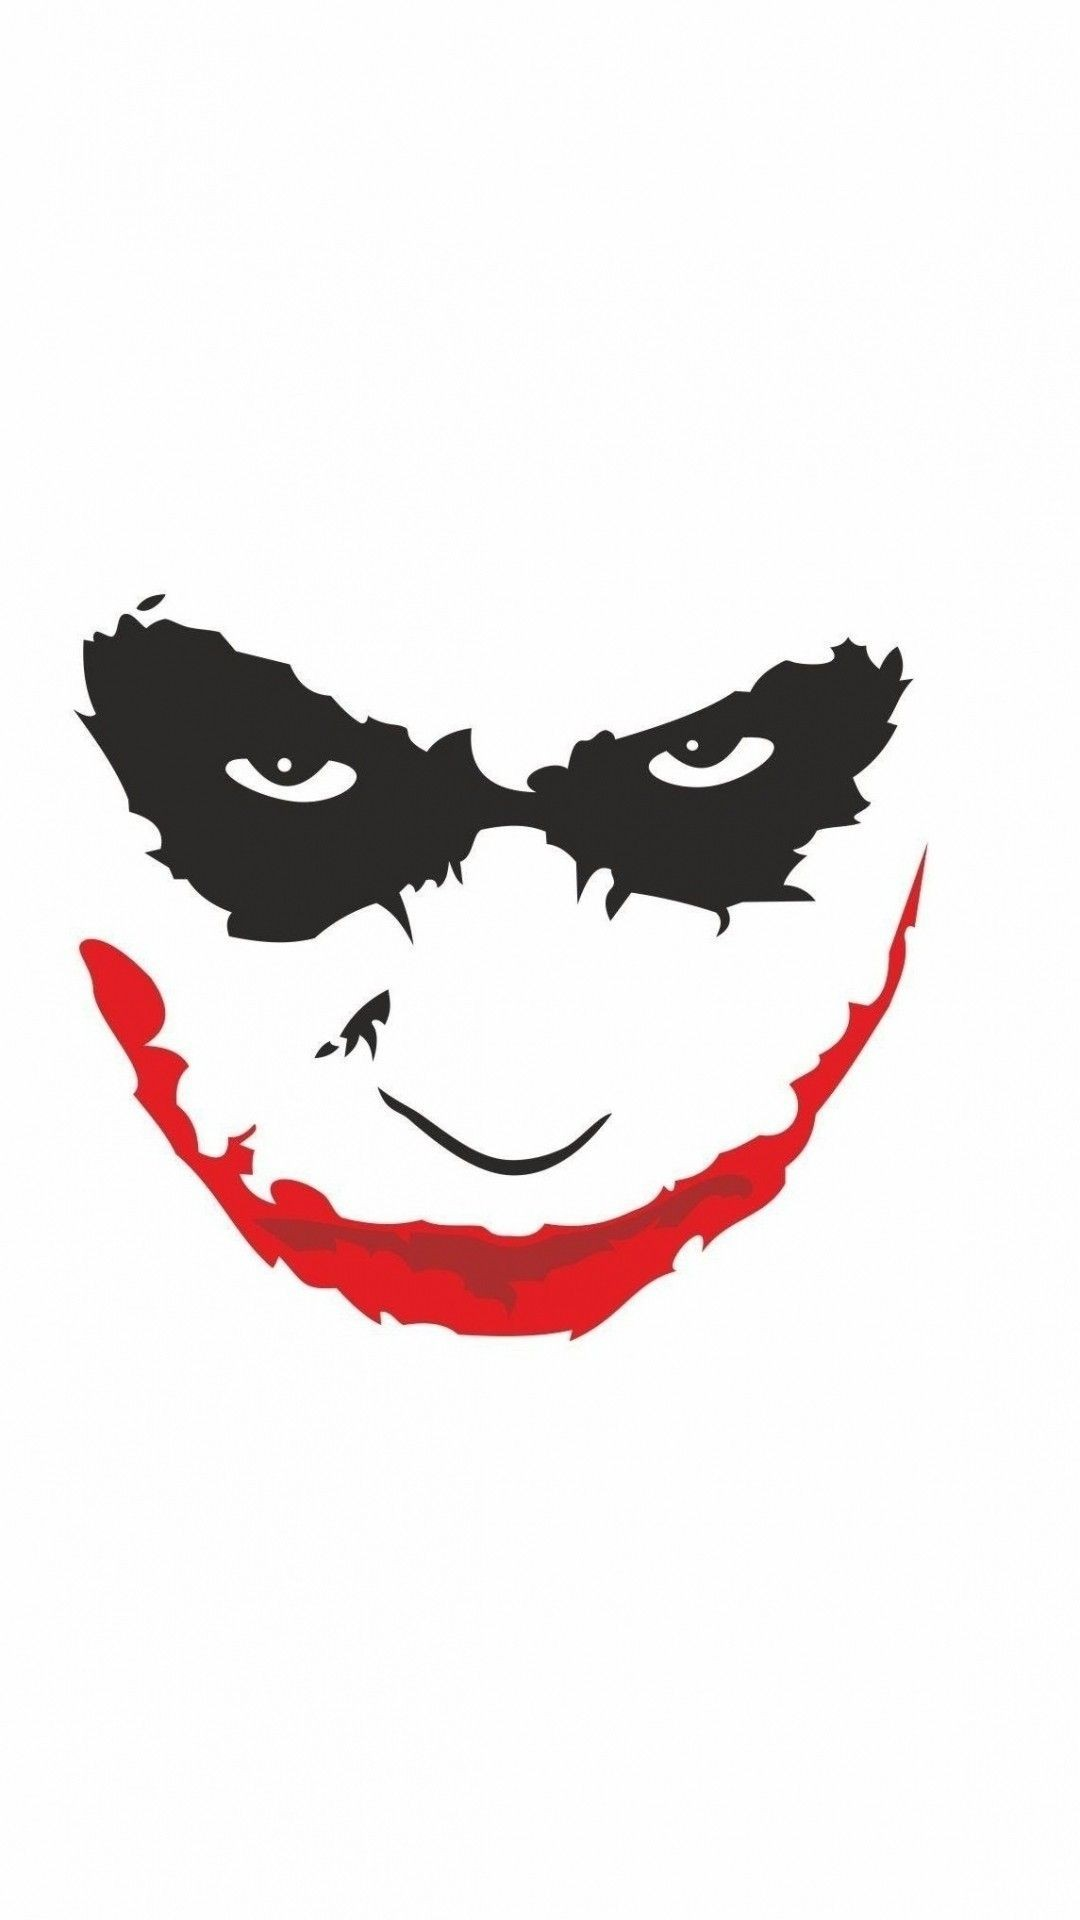 Wallpaper Joker Joker Face Image Download 1080x1920 Wallpaper Teahub Io